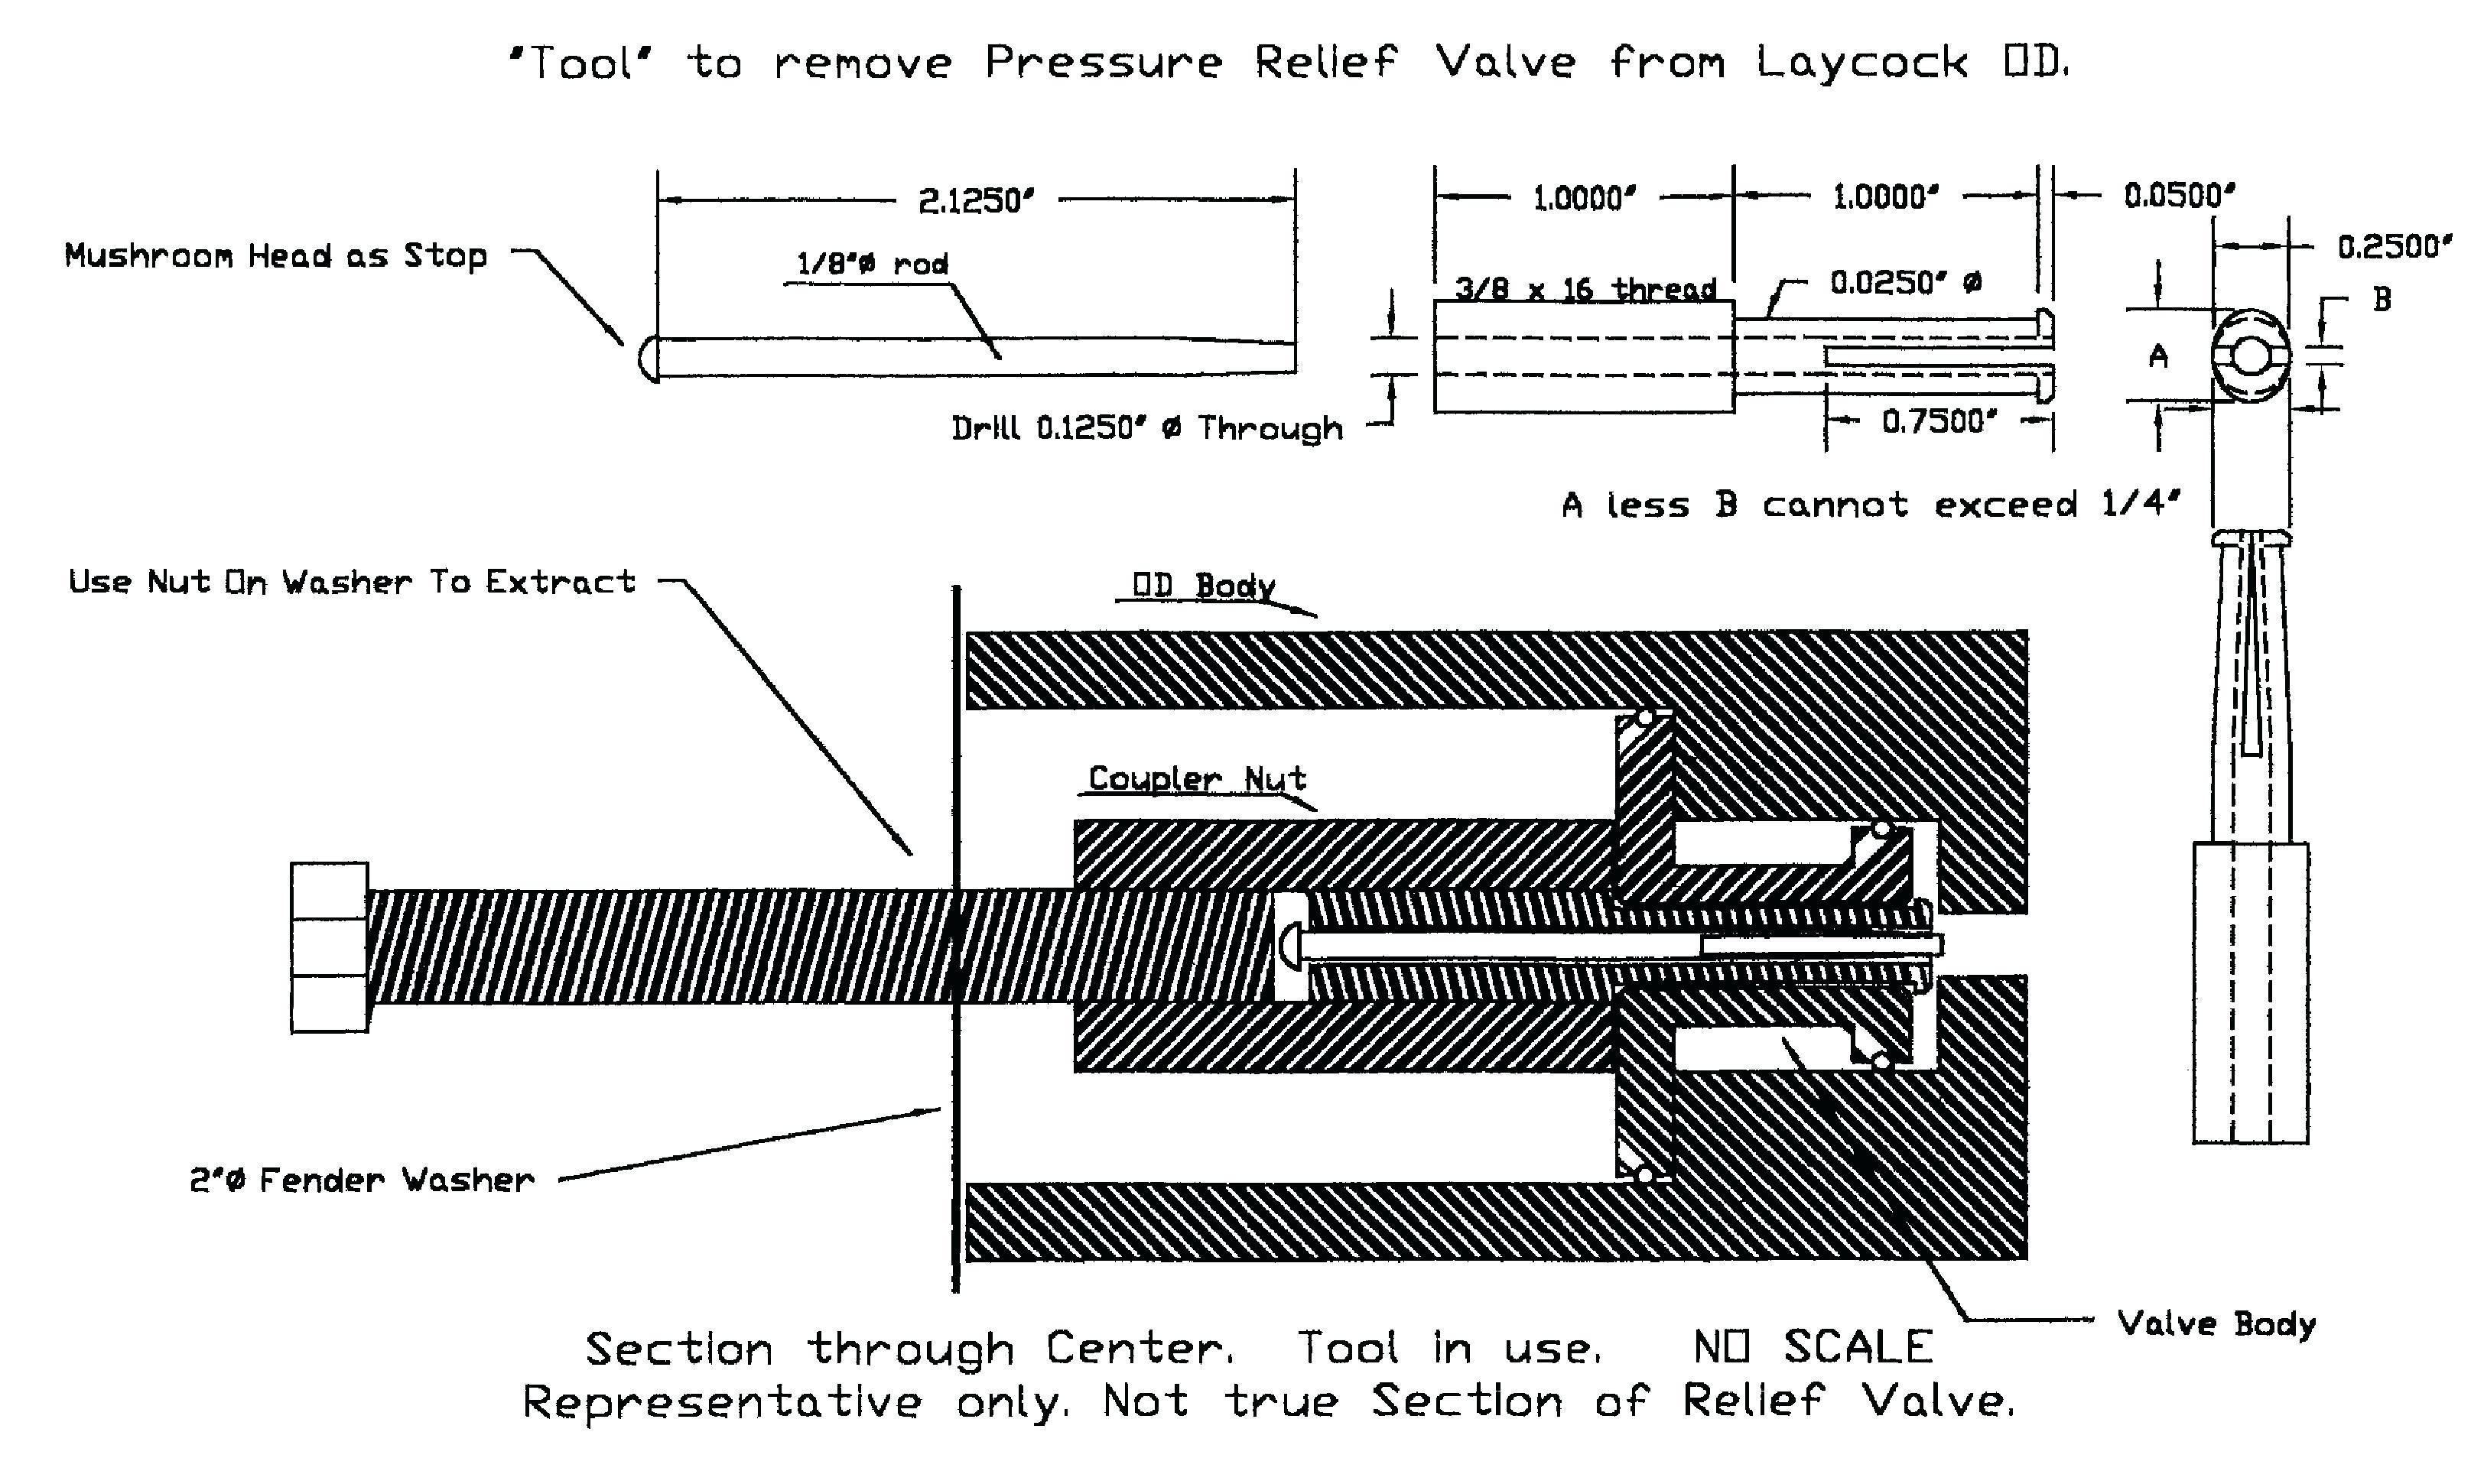 Electric Motor Wiring Diagram Single Phase Leeson Single Phase Motor Wiring Diagram Simplified Shapes Wiring Of Electric Motor Wiring Diagram Single Phase